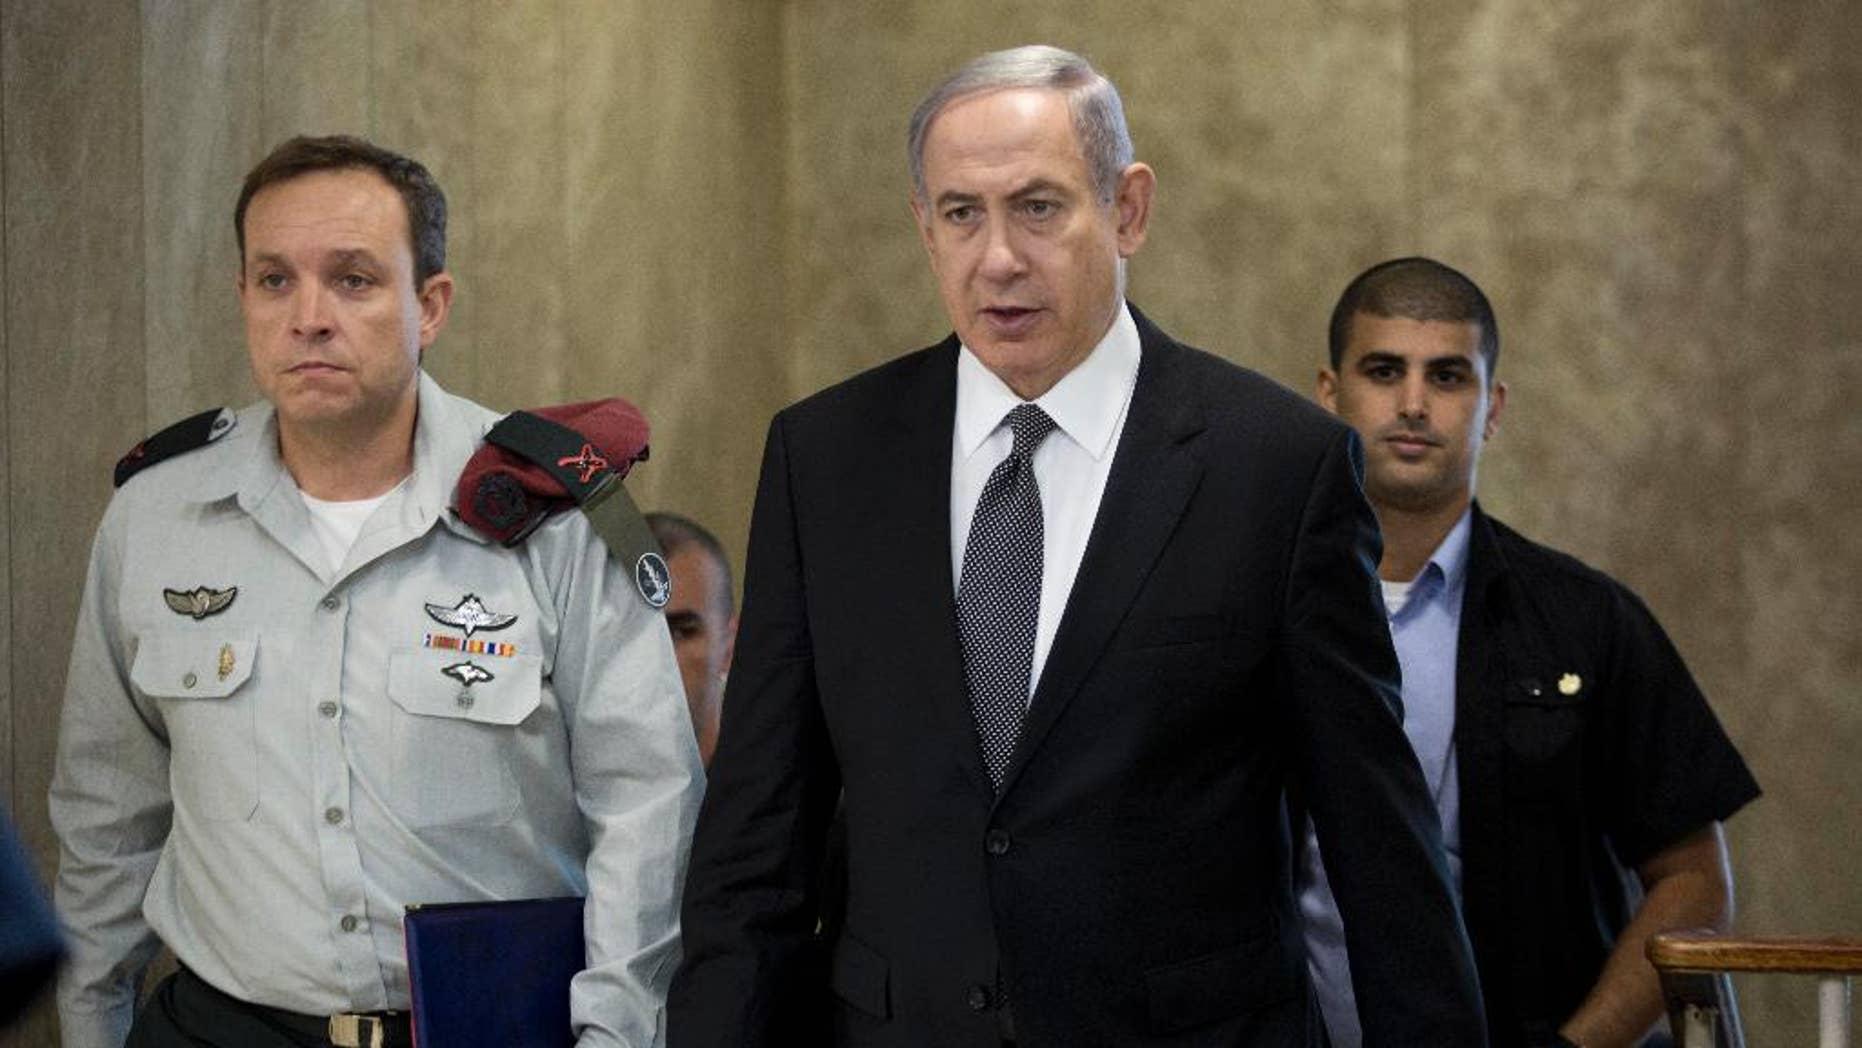 Israeli Prime Minister Benjamin Netanyahu attends the weekly cabinet meeting at his office in Jerusalem, Israel, Sunday, July 17, 2016. (Abir Sultan, Pool via AP)